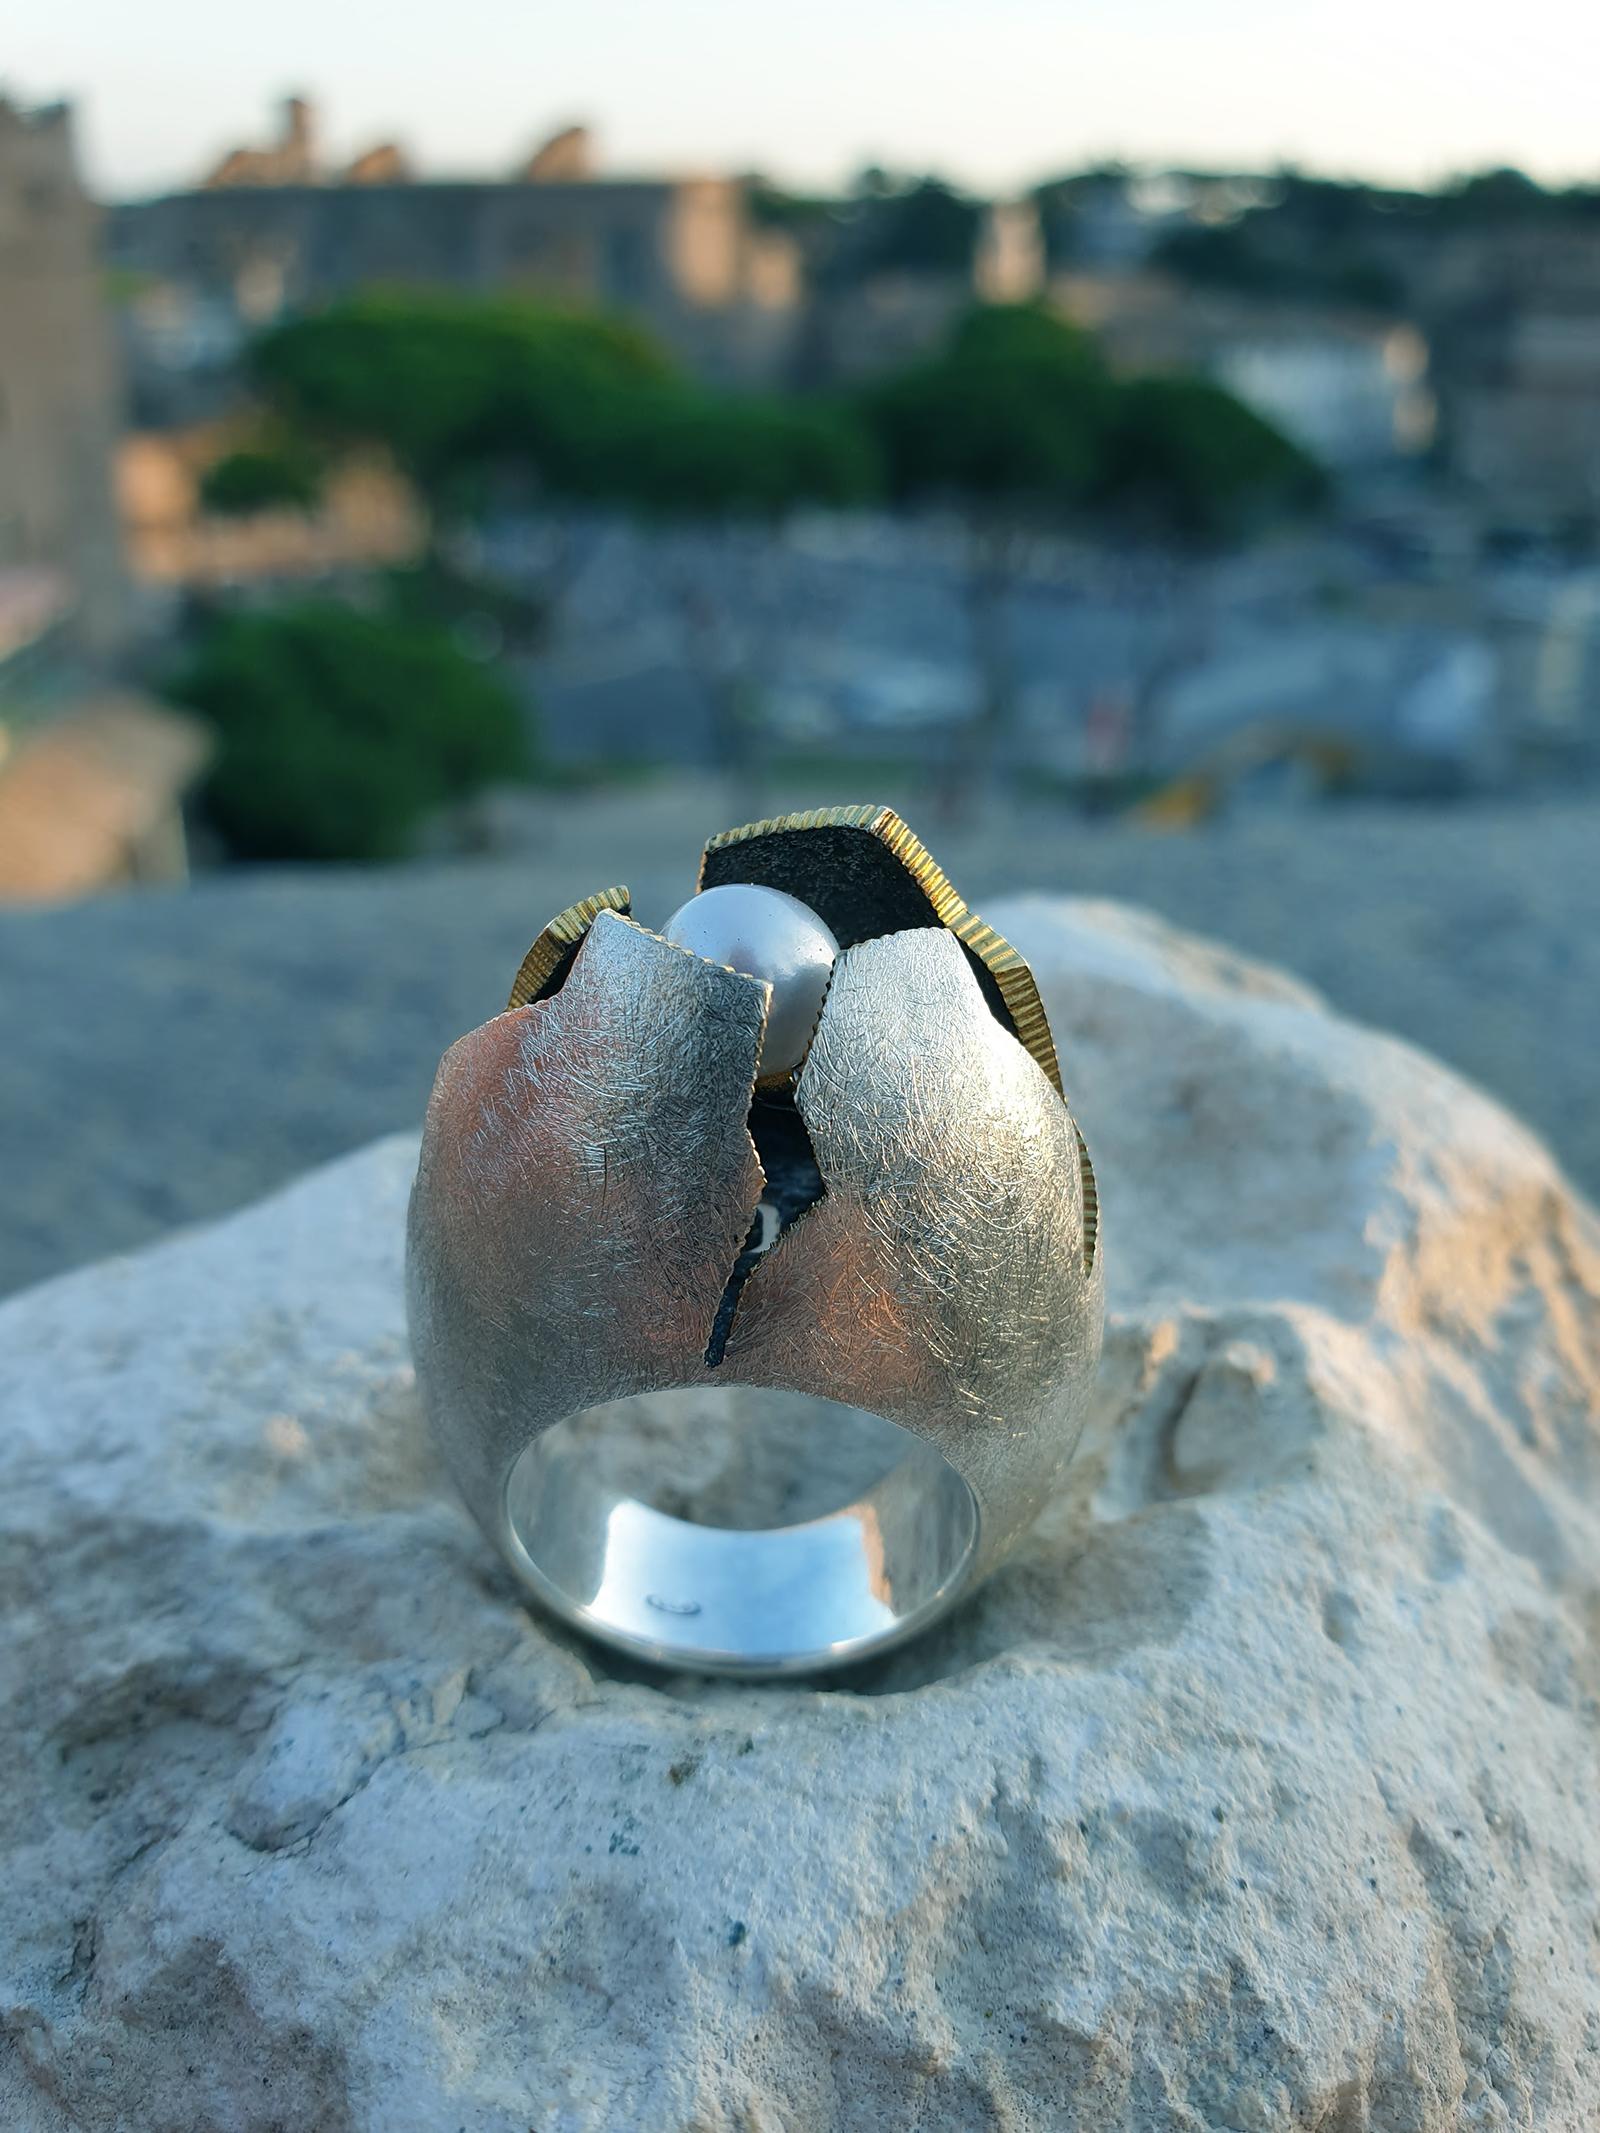 Angelo Donadeo, Uovo Cosmico, anello, argento 925, perla